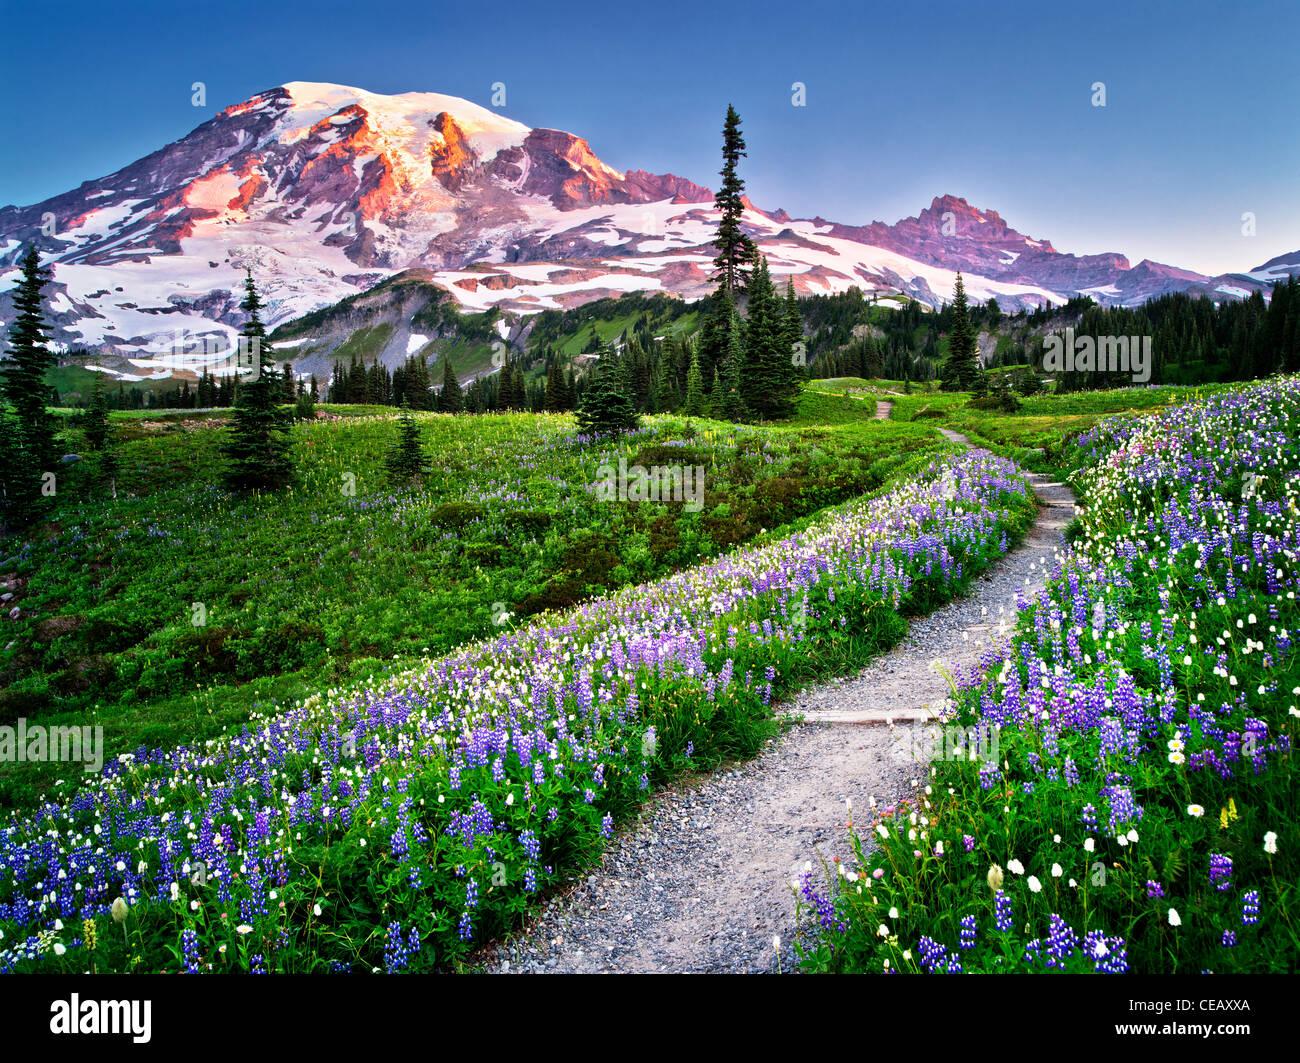 Path and wildflowers with Mt. Rainier. Mt. Rainier National Park, Washington - Stock Image